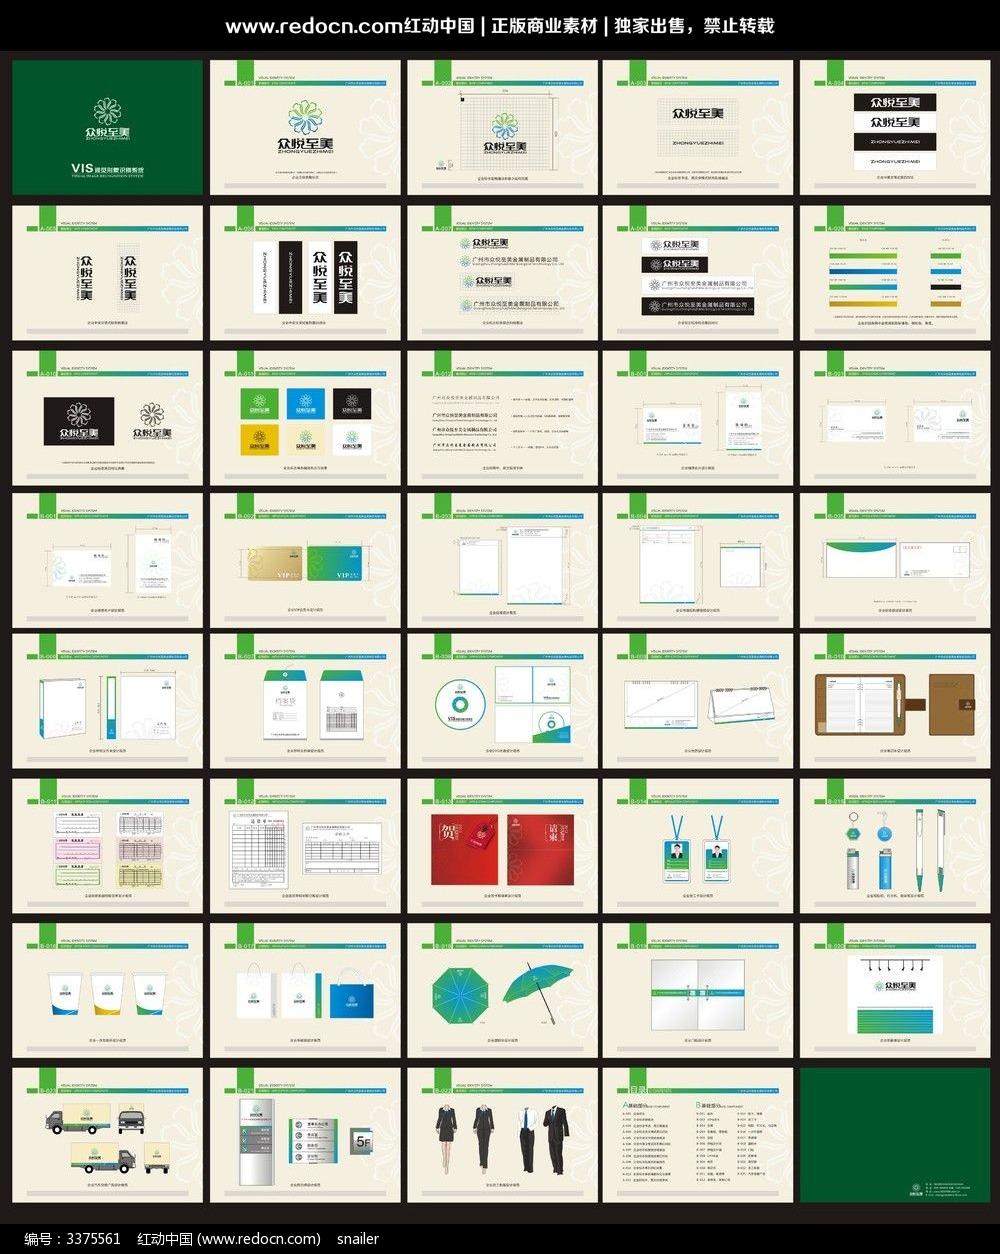 vi品牌形象推广手册 vi设计模板下载 vi作业 基础部分要素系统 企业vi